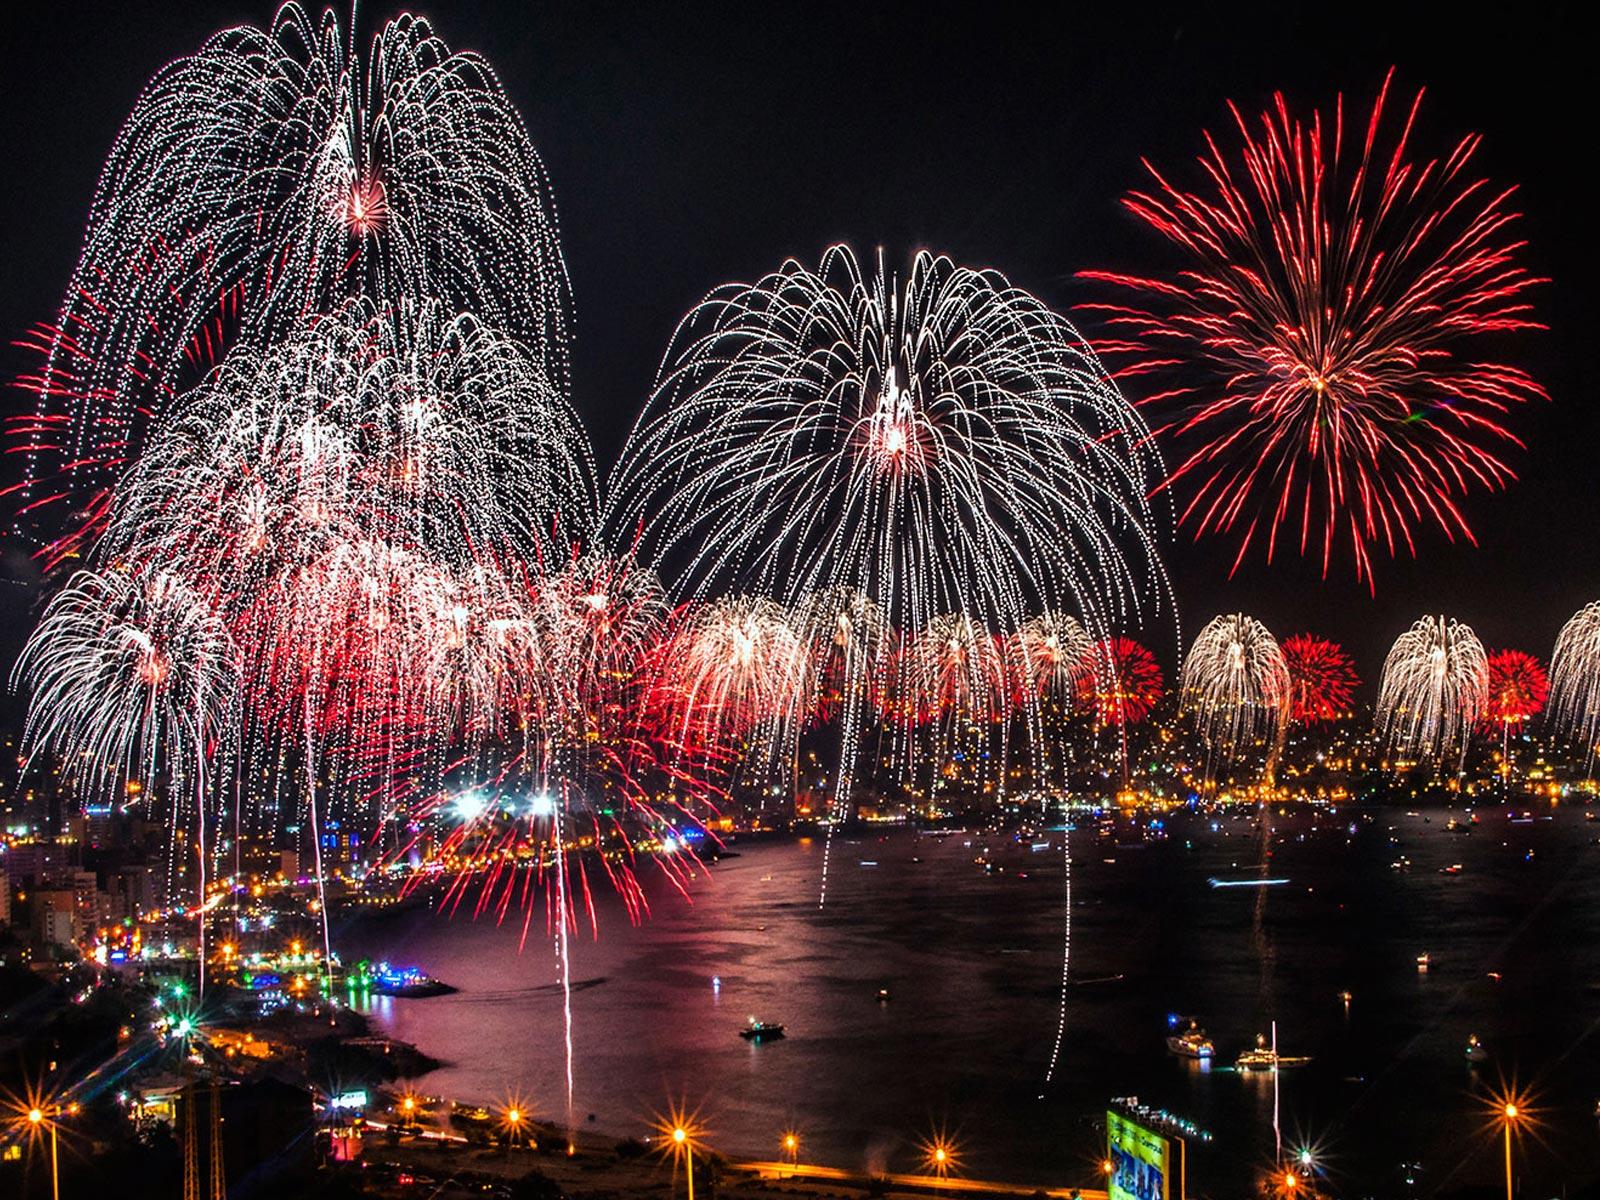 73] Fireworks Background on WallpaperSafari 1600x1200